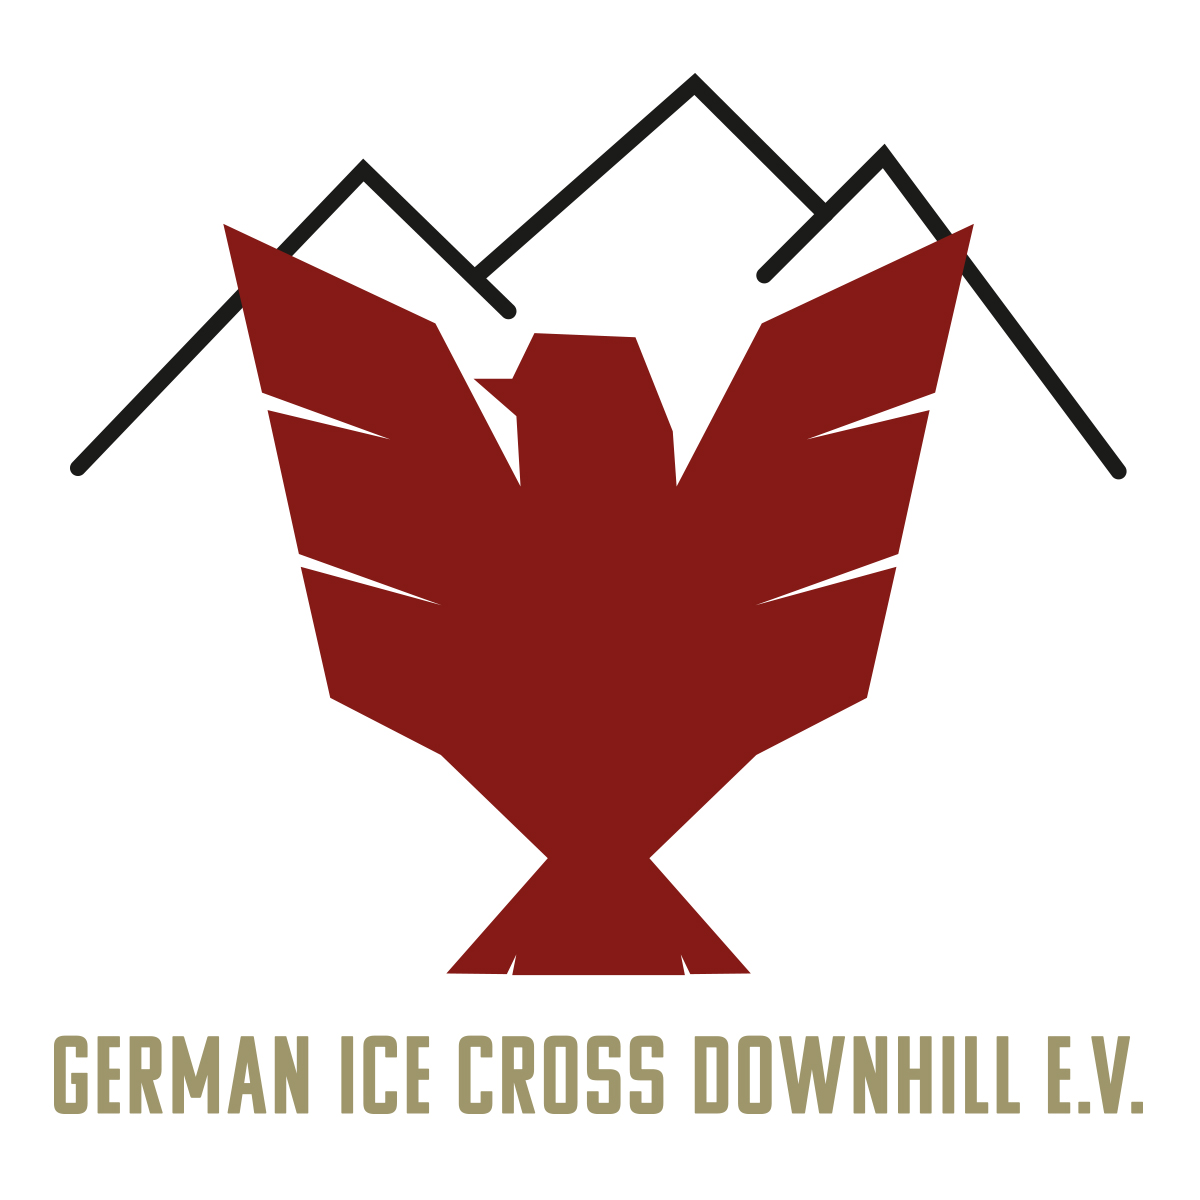 German Ice Cross Downhill